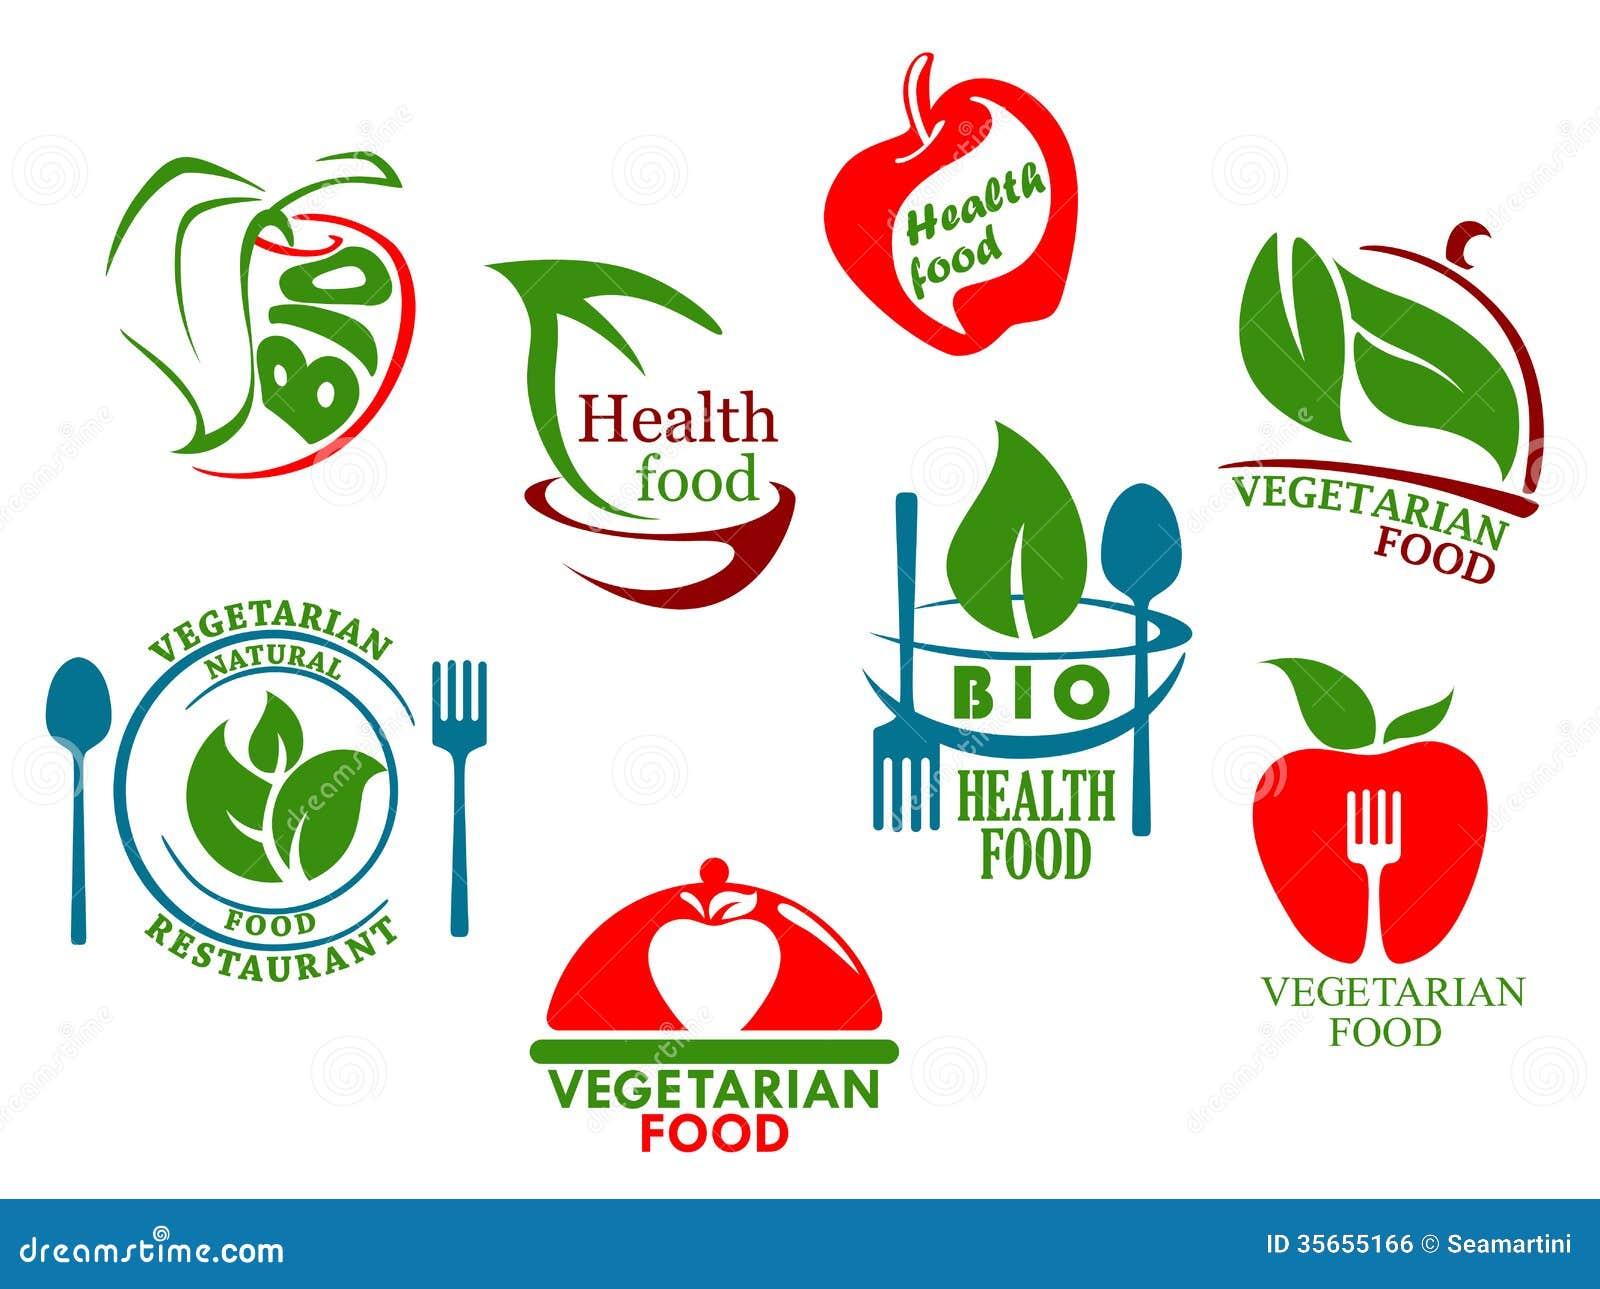 Vegetarian Food Symbols Stock Vector Illustration Of Meal 35655166